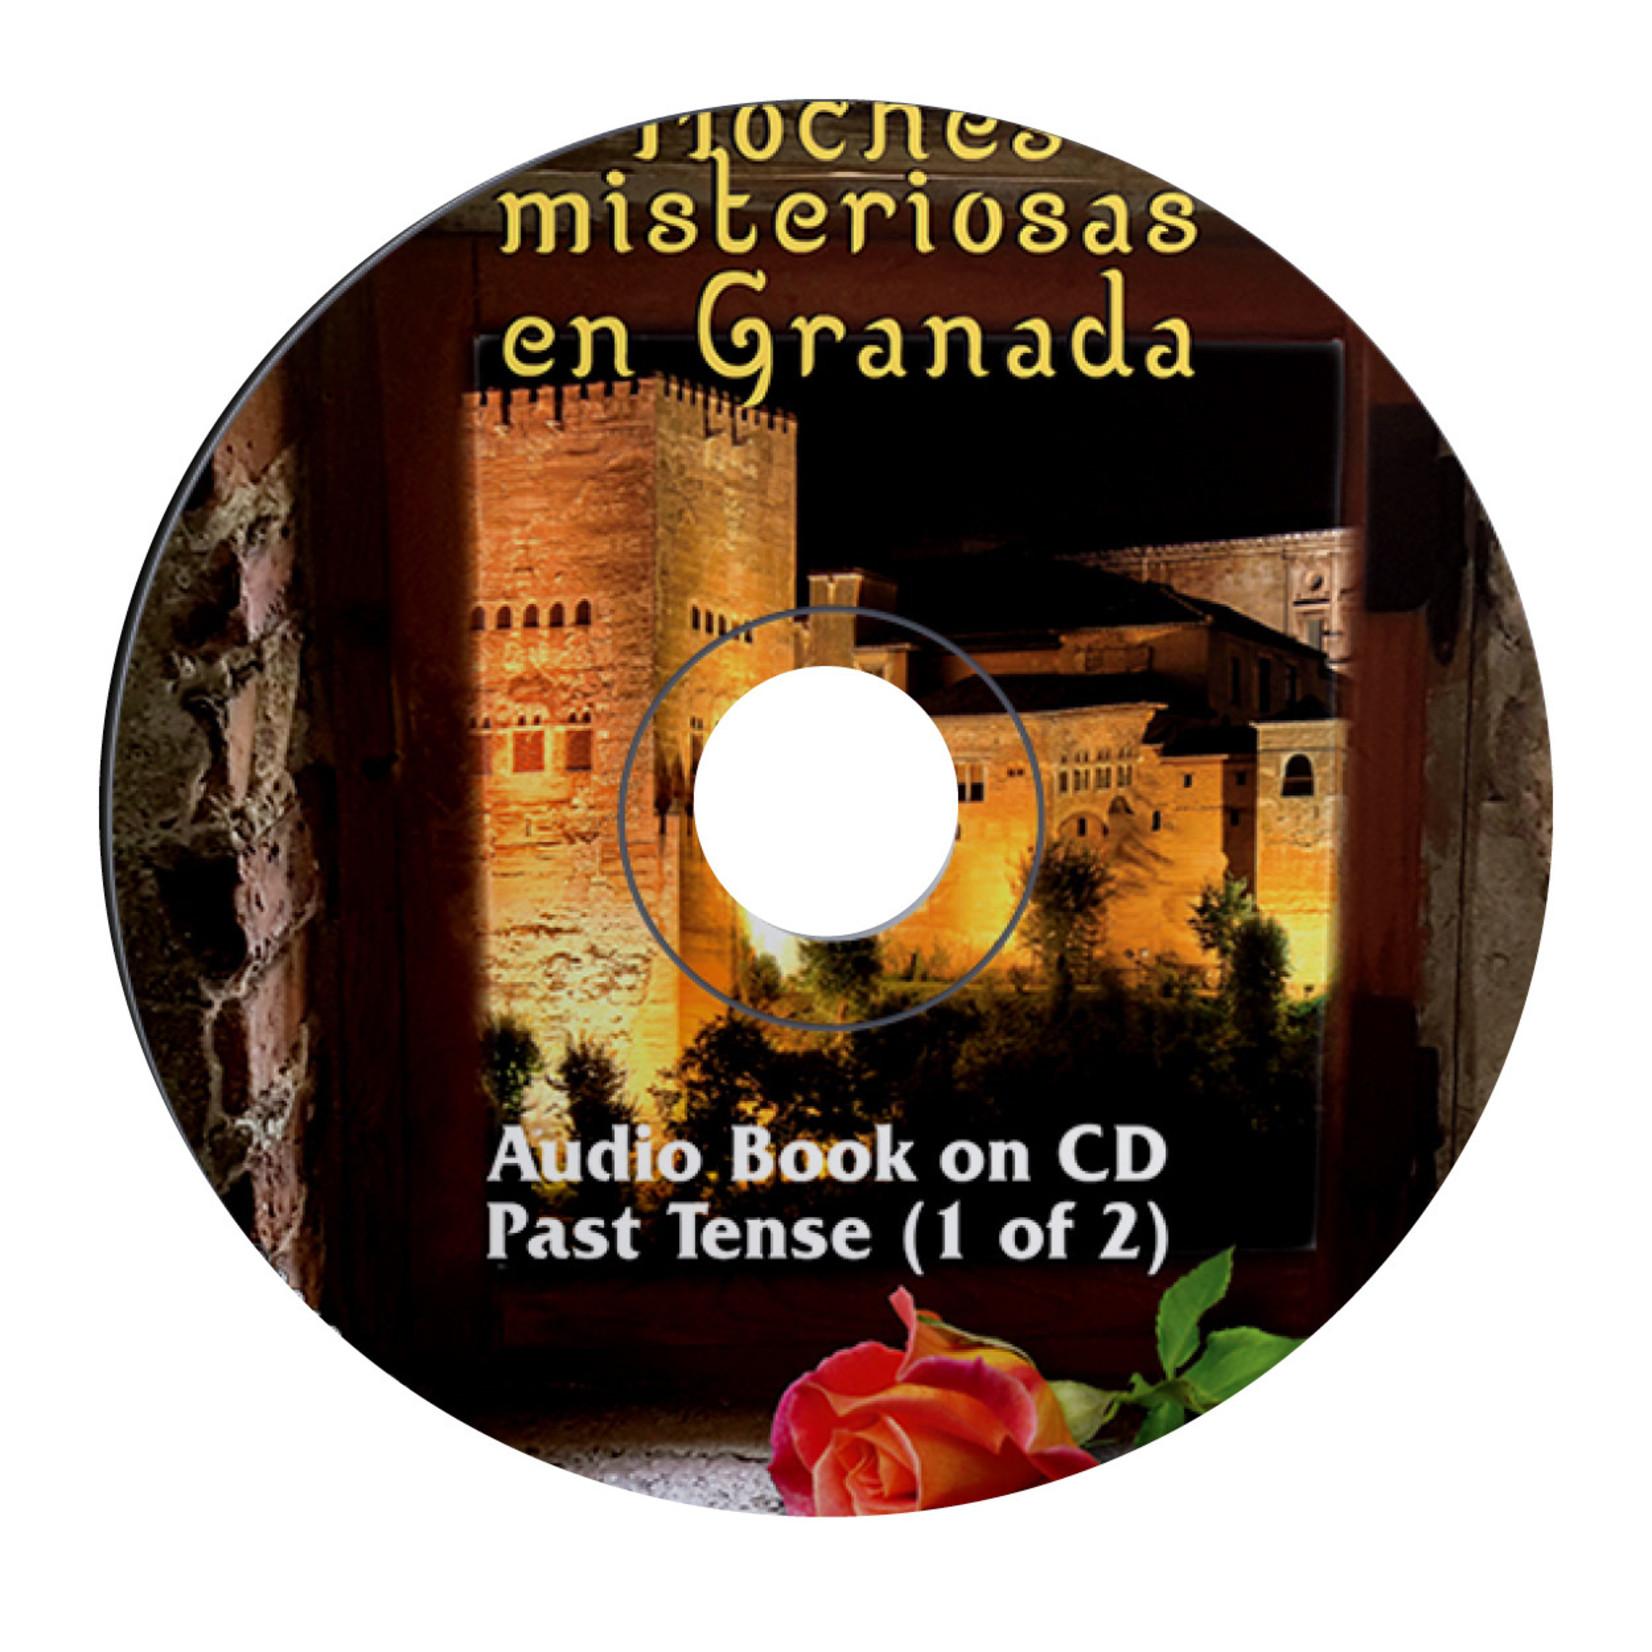 Fluency Matters Noches misteriosas en Granada - Audiobook